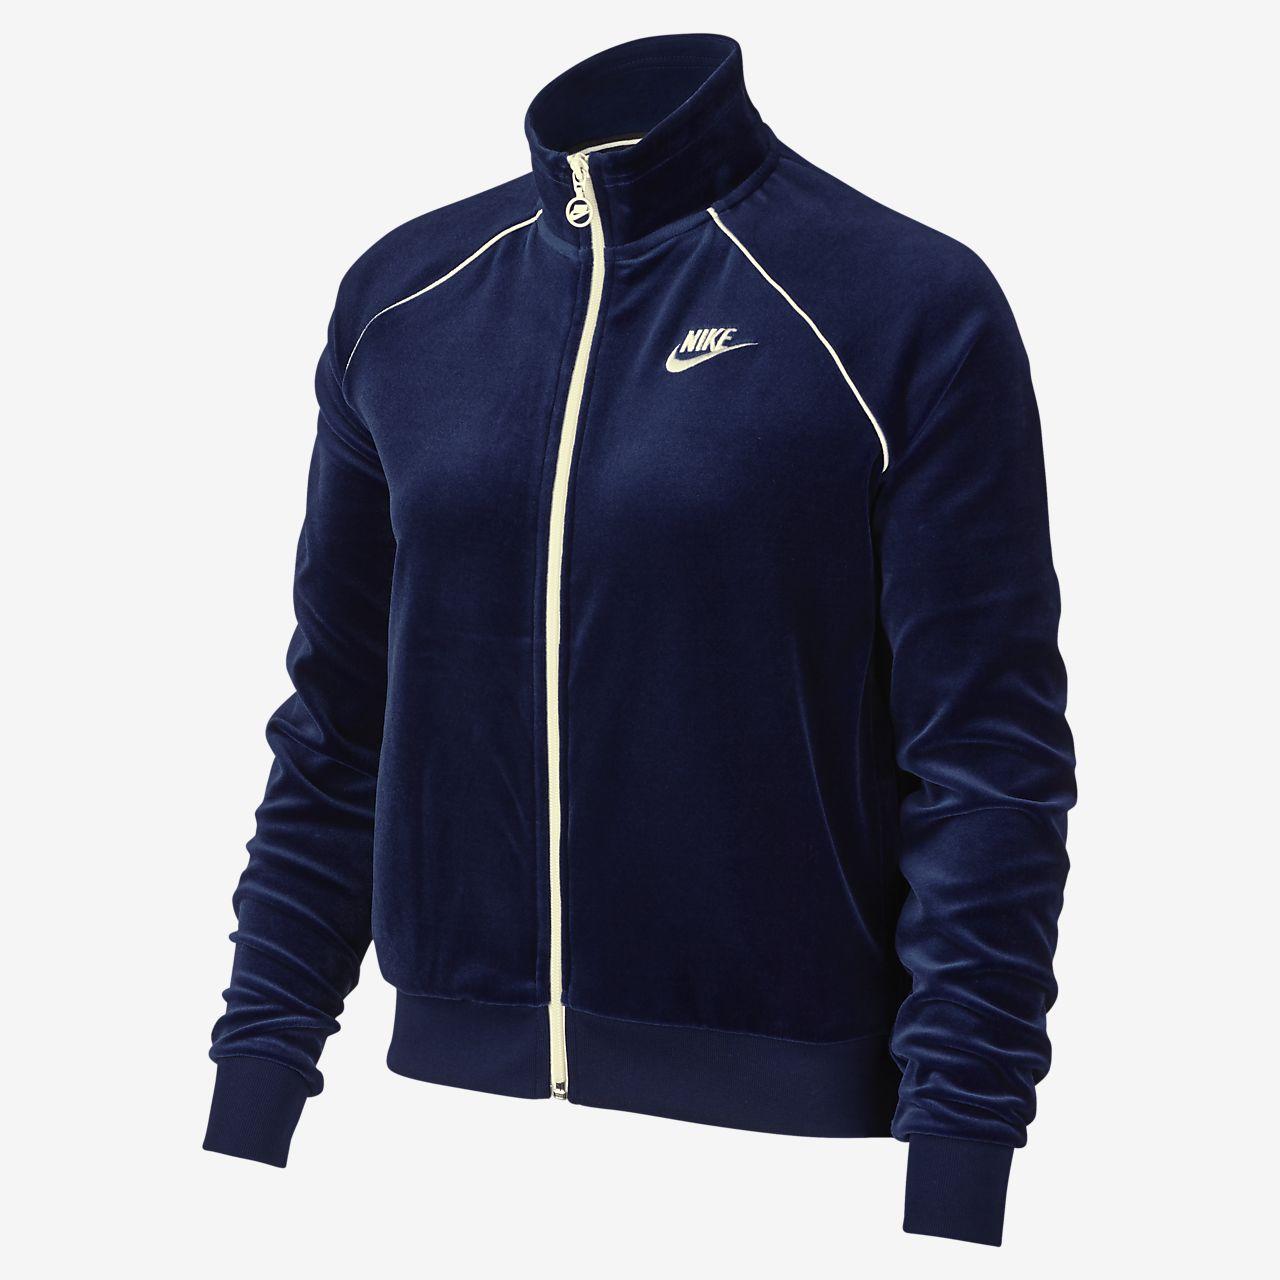 Chamarra de entrenamiento de velour para mujer Nike Sportswear